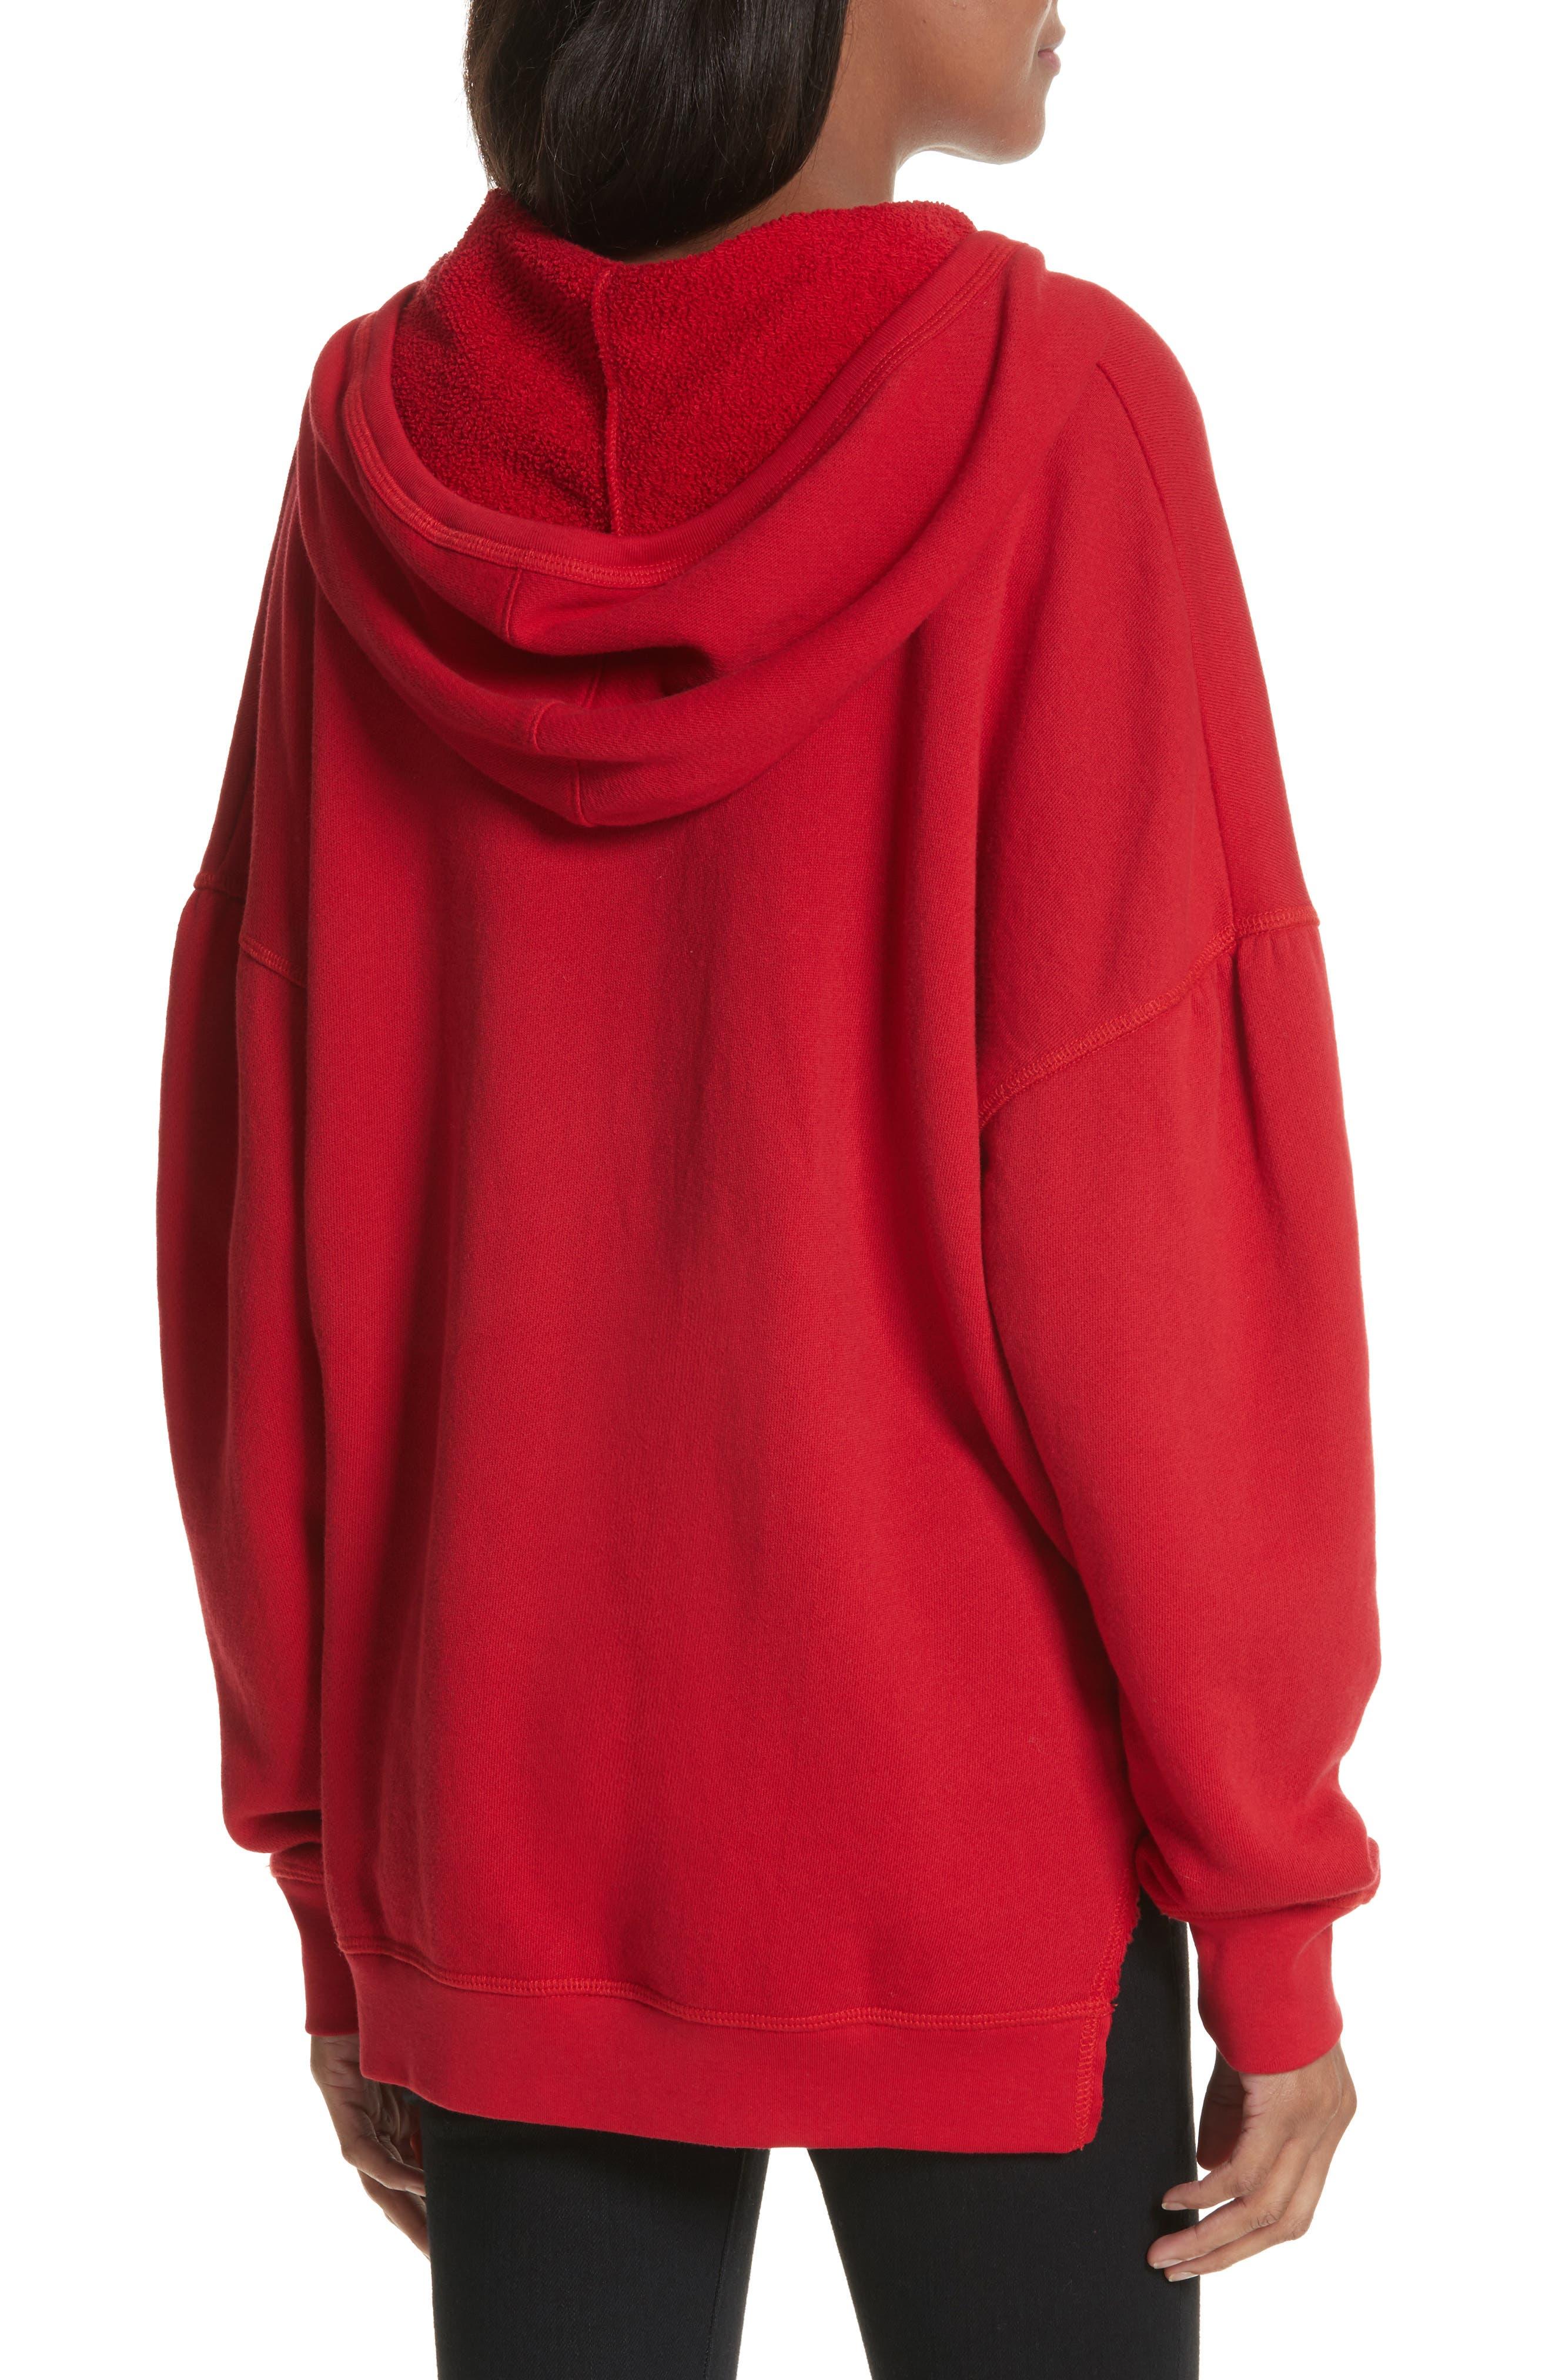 Adene Hooded Sweatshirt,                             Alternate thumbnail 2, color,                             Matador Red